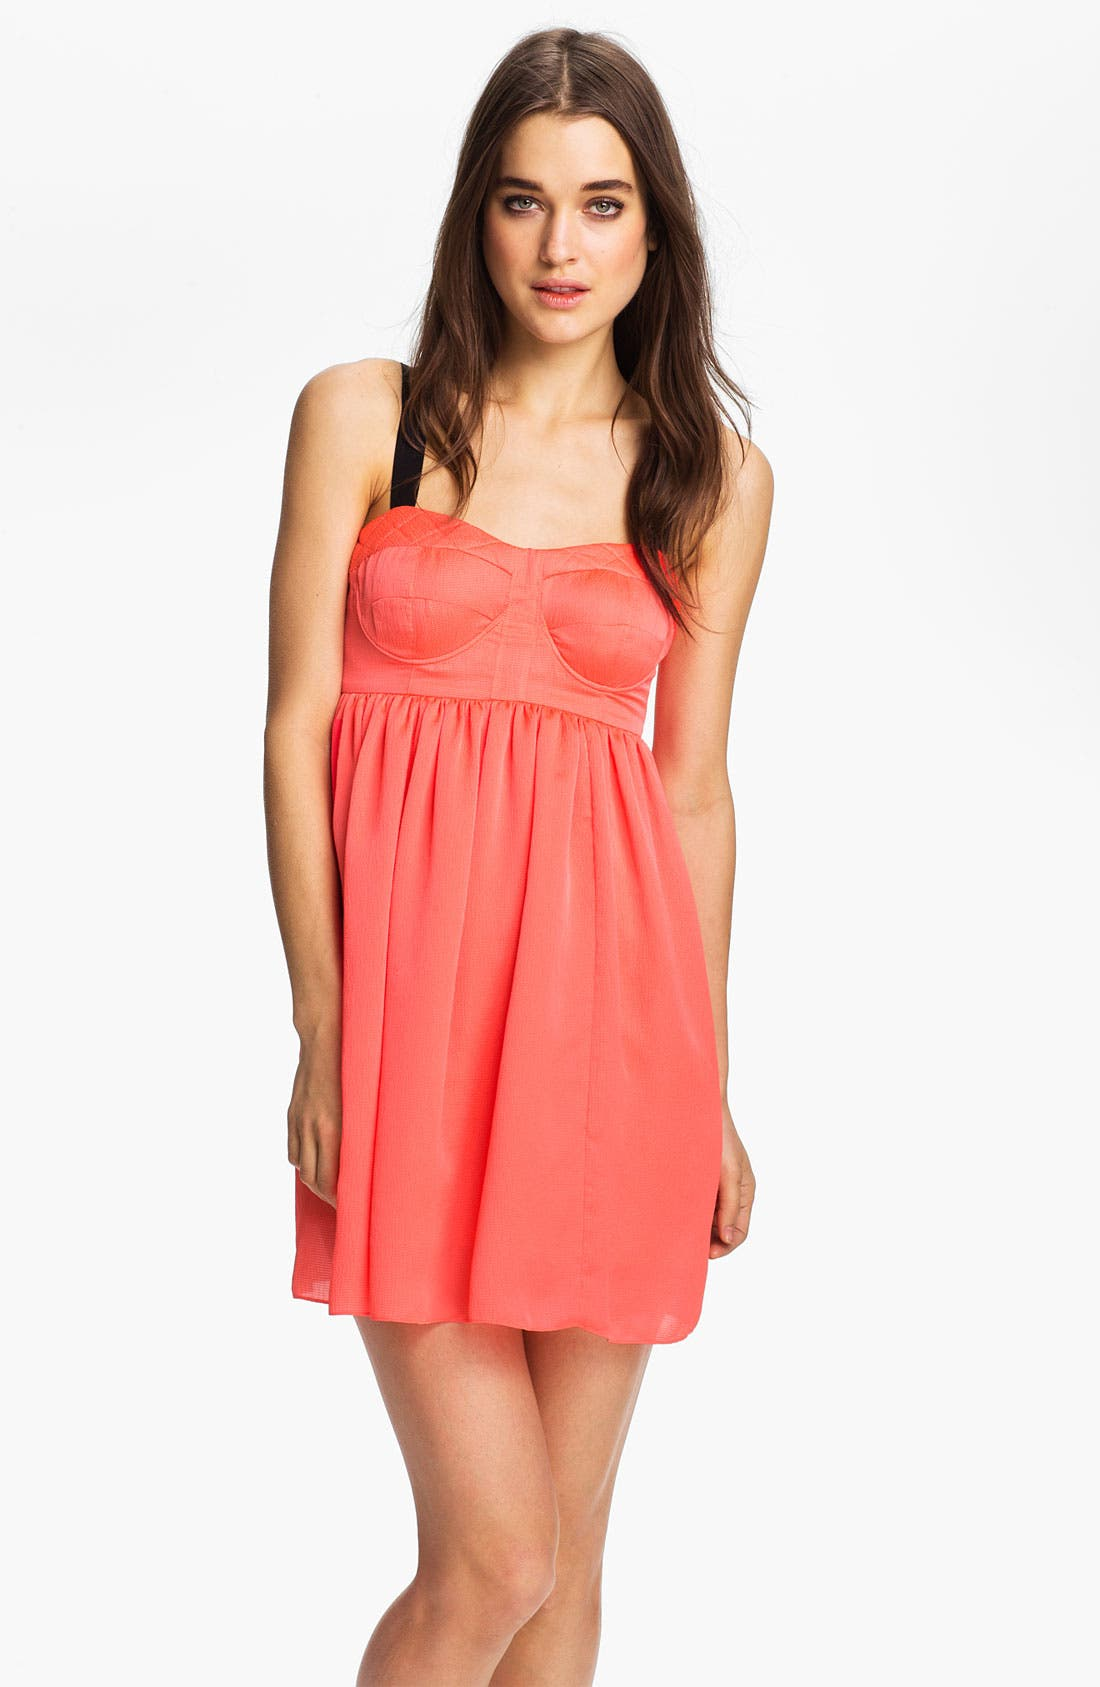 Main Image - Rebecca Minkoff 'Jami' Bustier Babydoll Dress